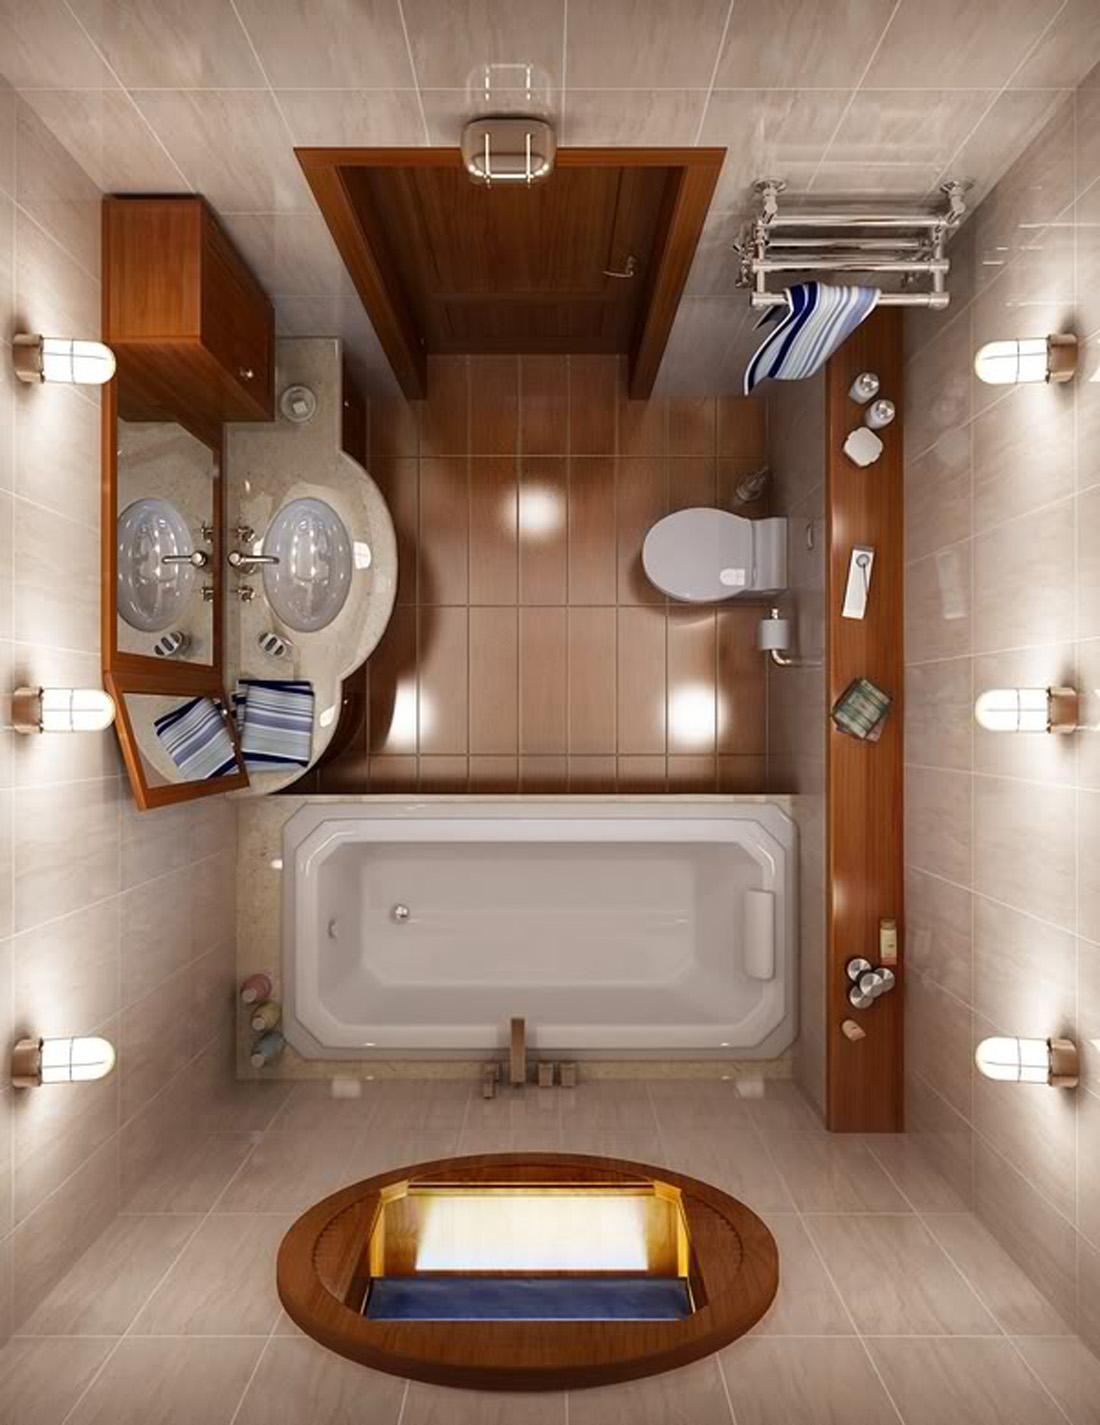 bathroom-color-ideas-for-small-bathrooms